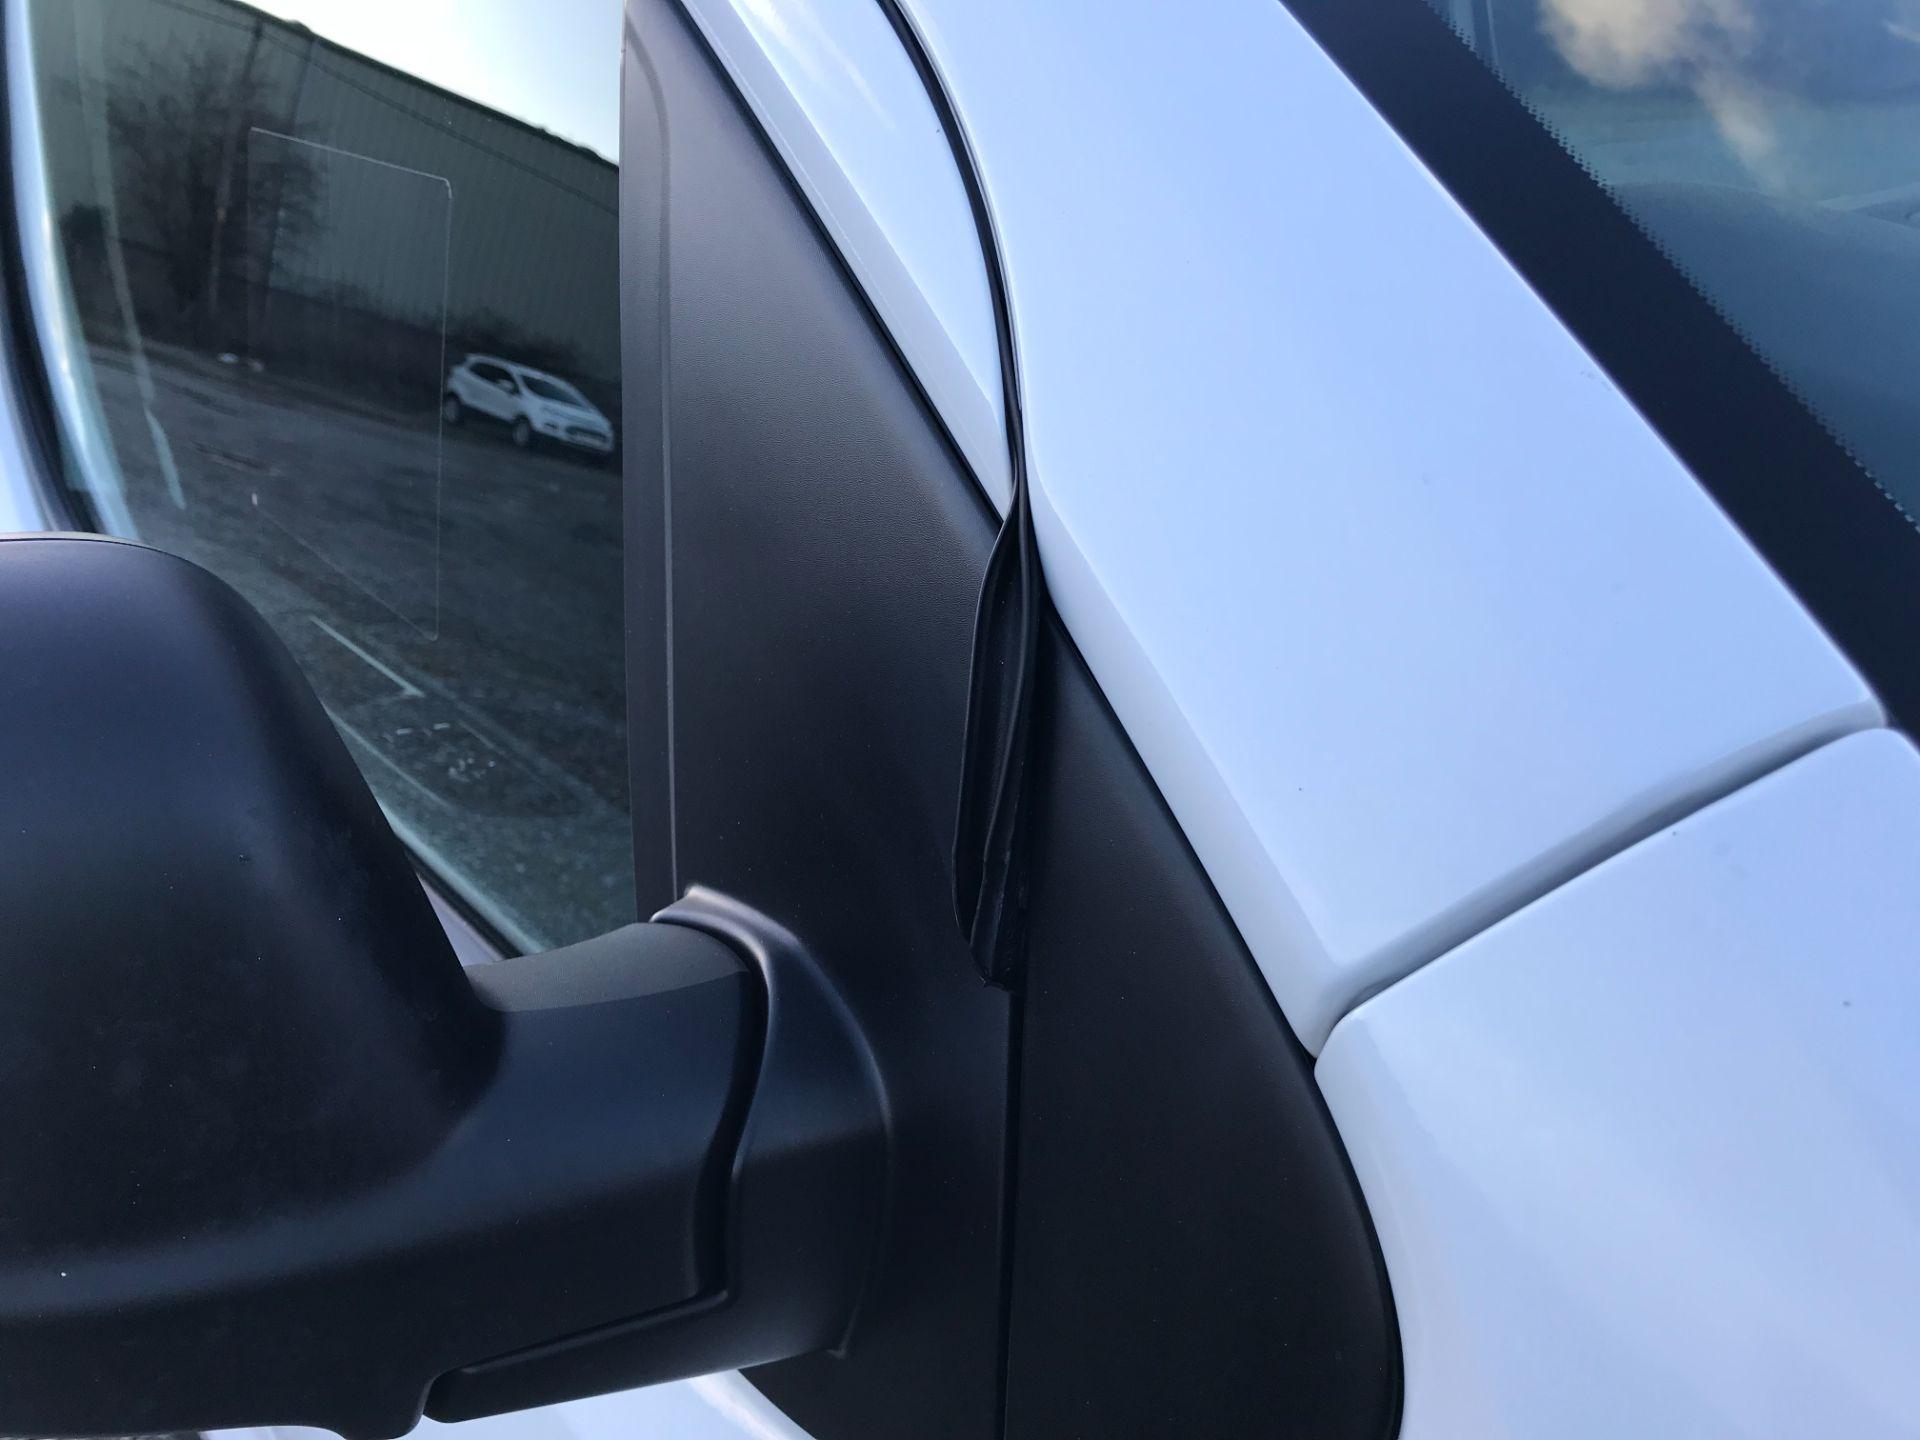 2018 Peugeot Expert  STANDARD 1000 1.6 BLUEHDI 95 S EURO 6 (NU18VEL) Image 37